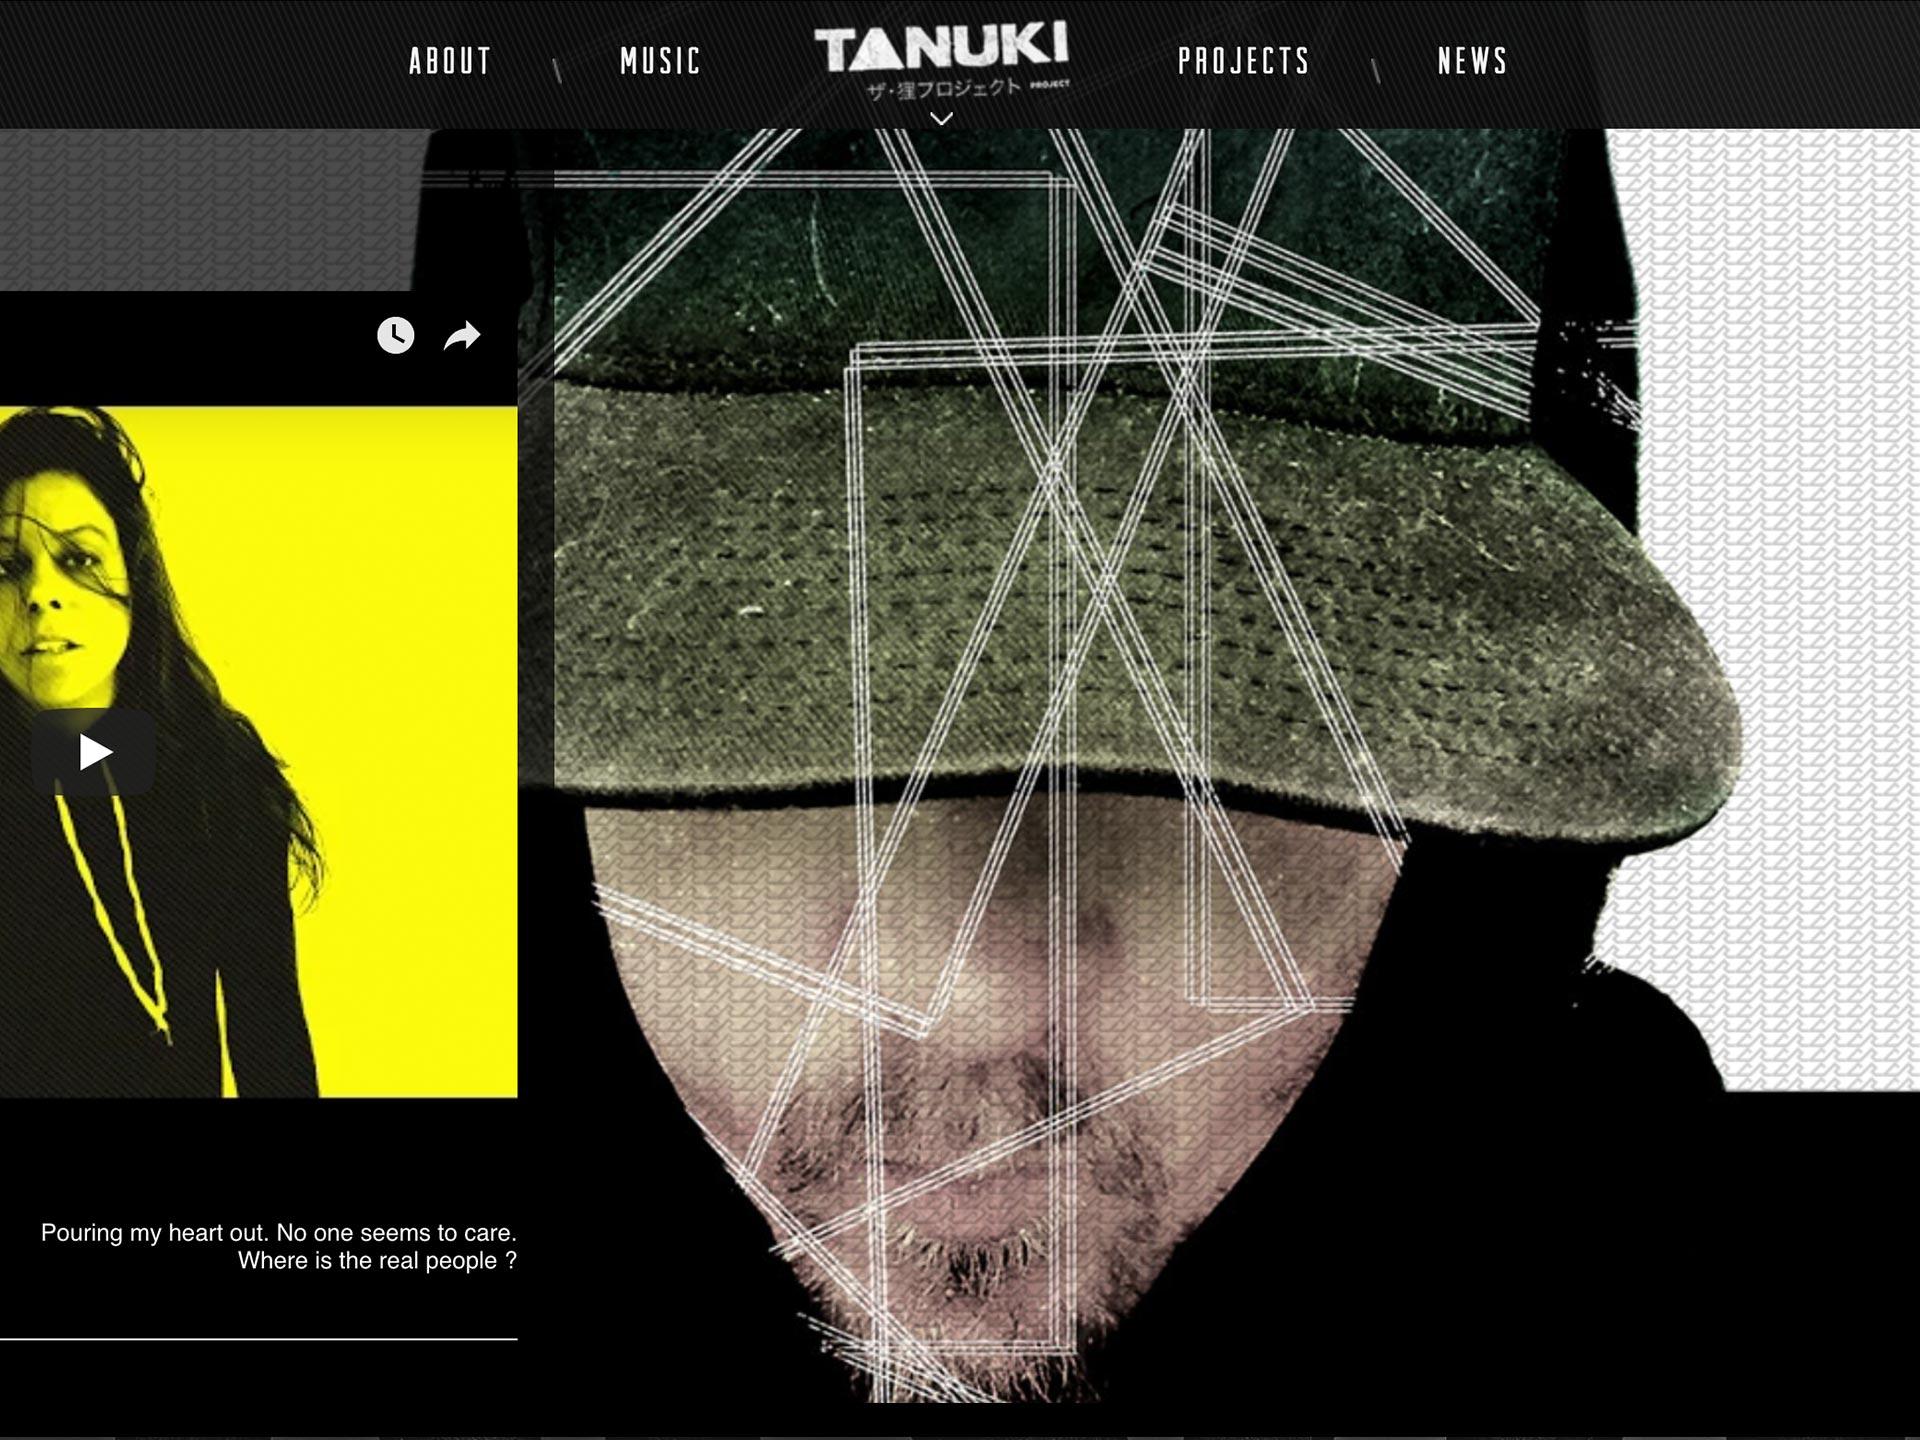 la-cuisine-mtl-tanuki-project3